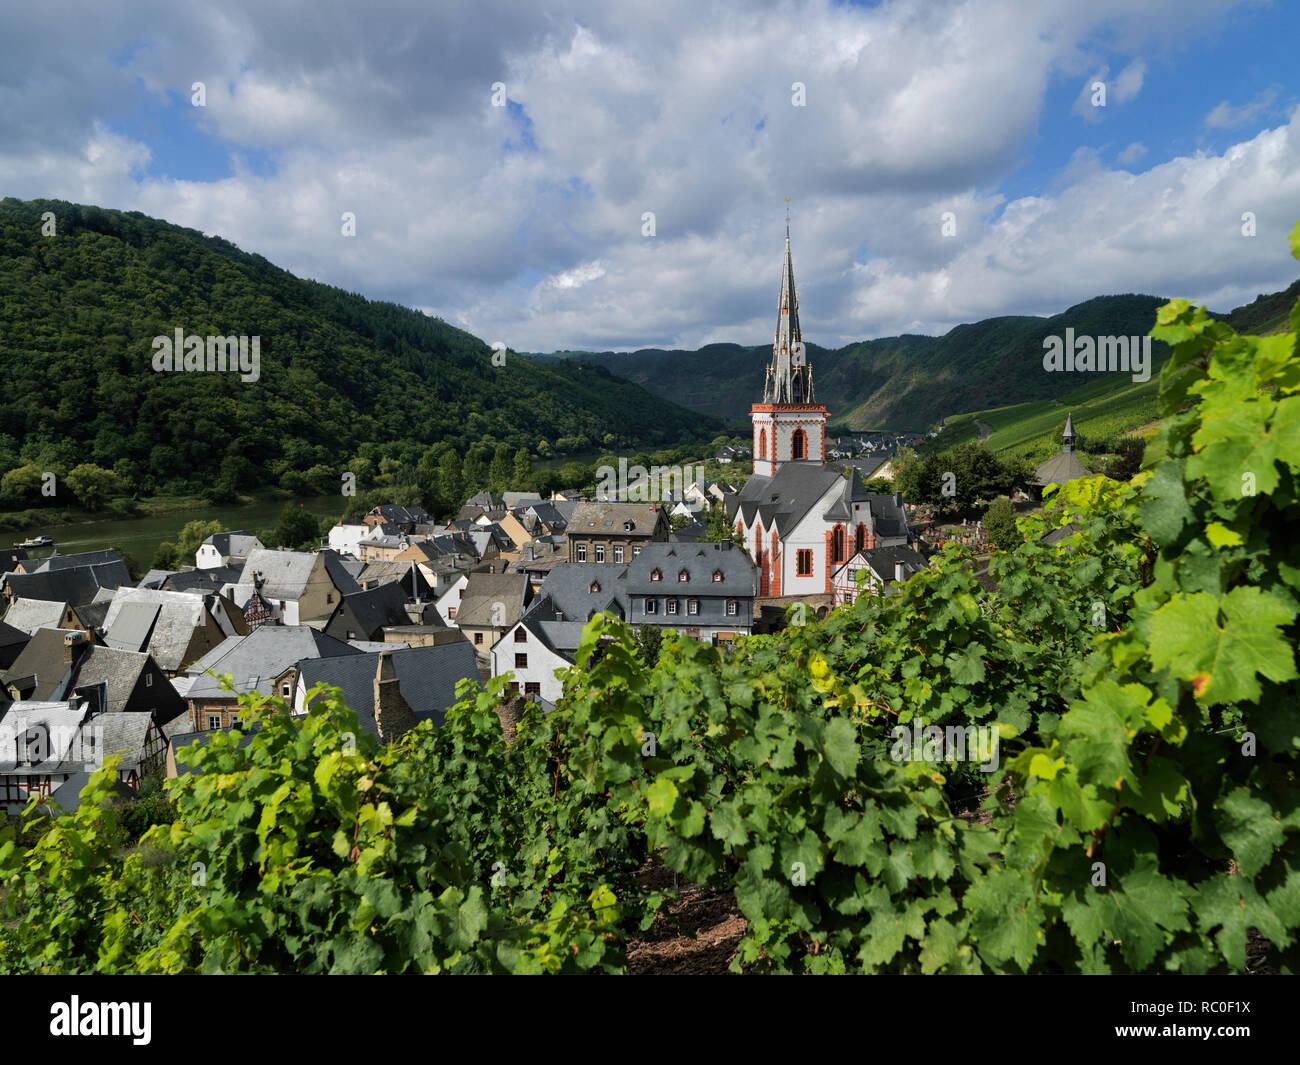 Pfarrkirche St. Martin, Ediger-Eller, Mittelmosel, Landkreis Cochem-Zell, Rheinland-Pfalz, Deutschland, Europa | church St. Martin, Ediger-Eller, dist - Stock Image